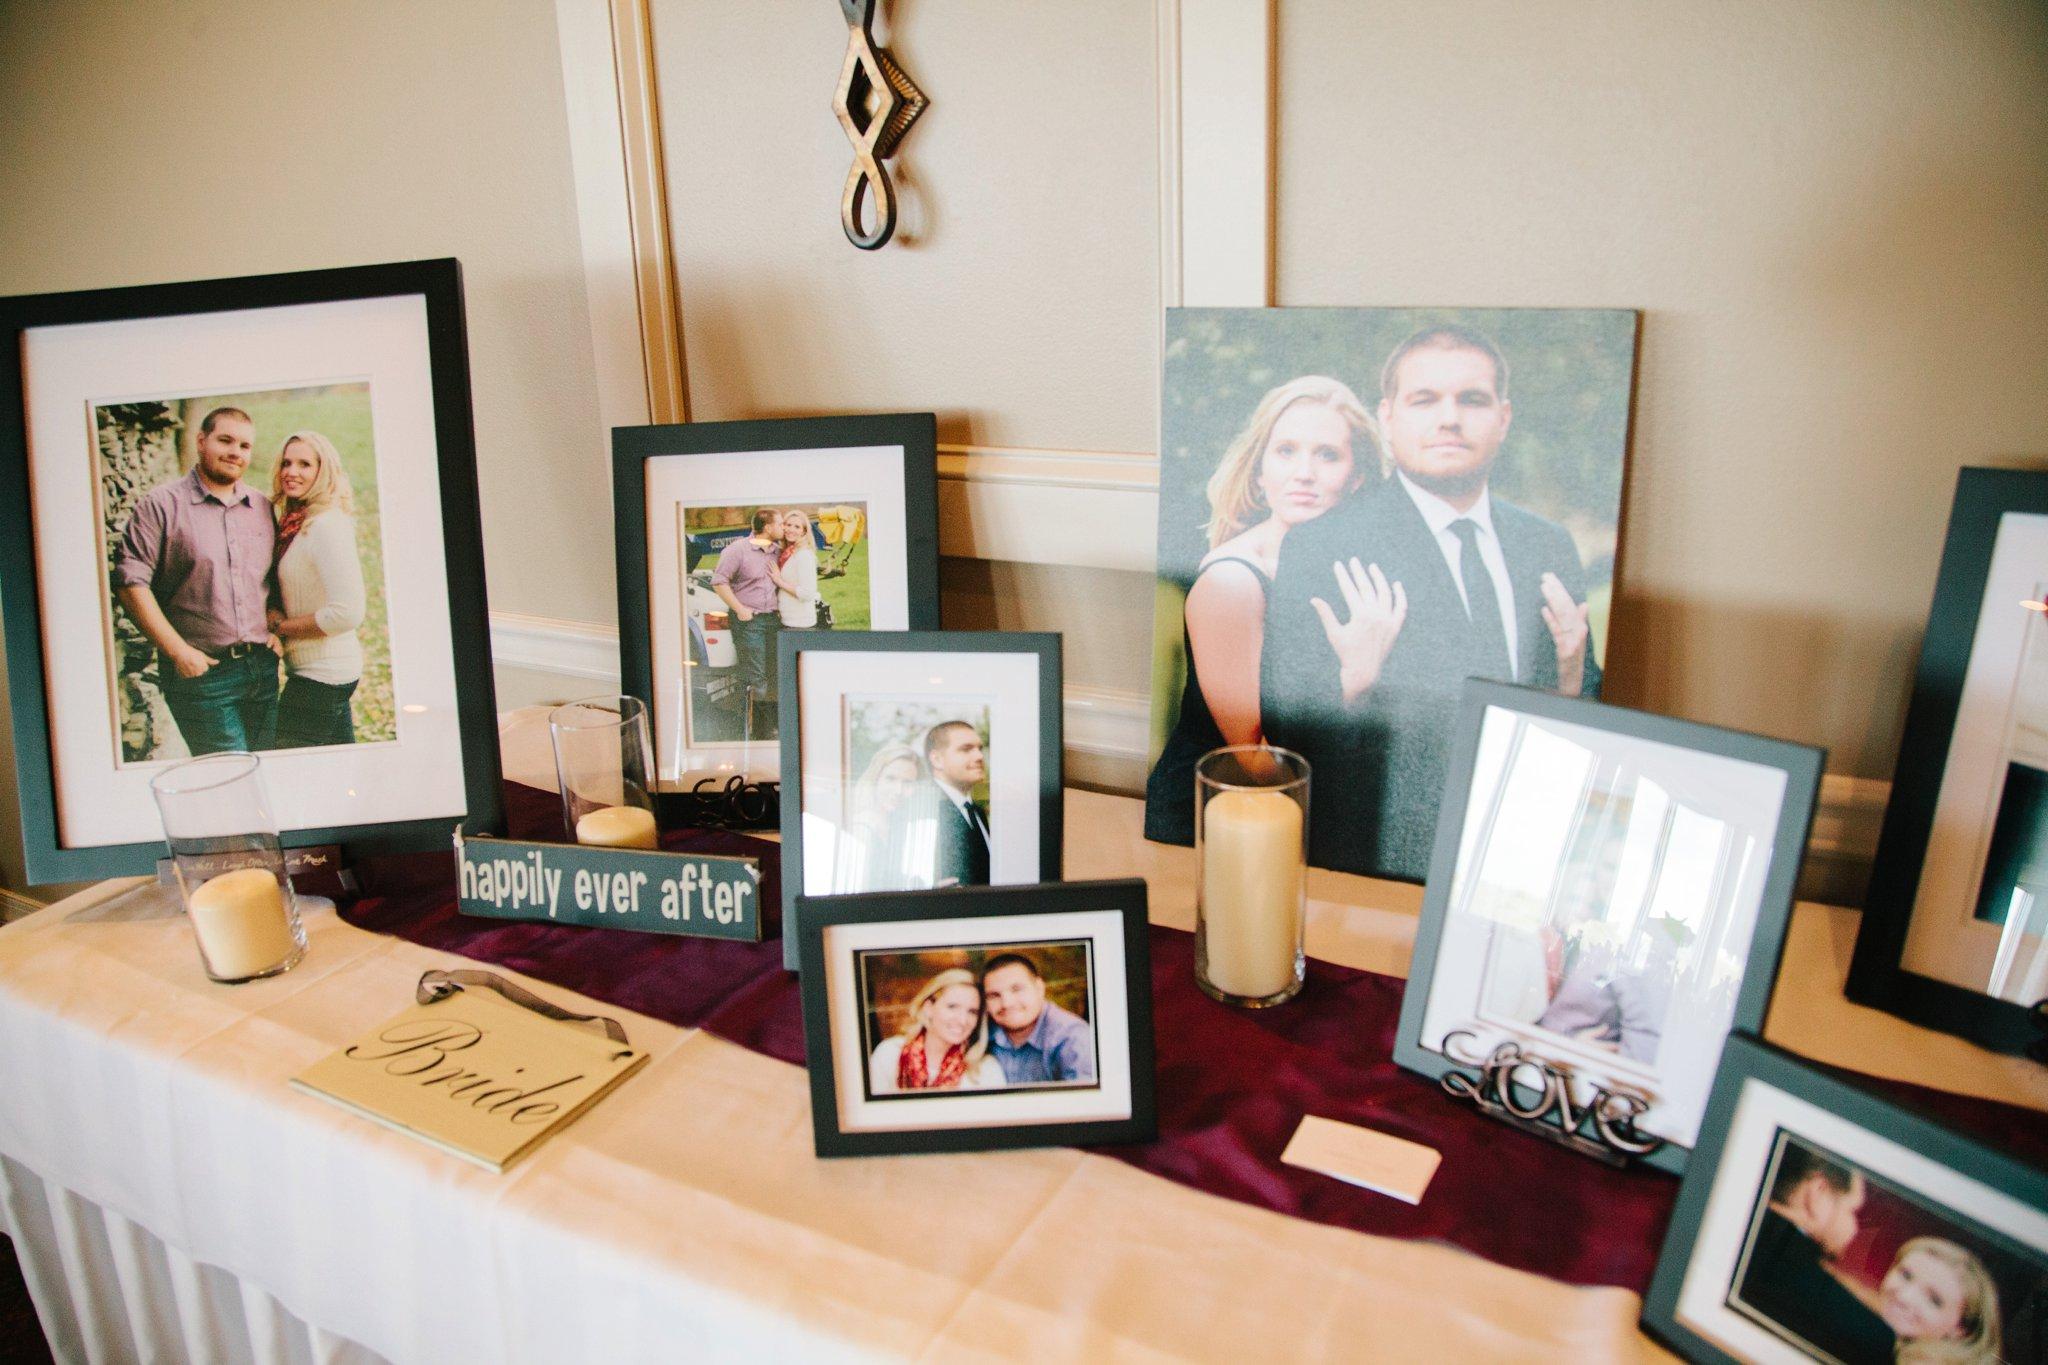 montdale_country_club_wedding_photos_photographer_scranton_pa7493.jpg